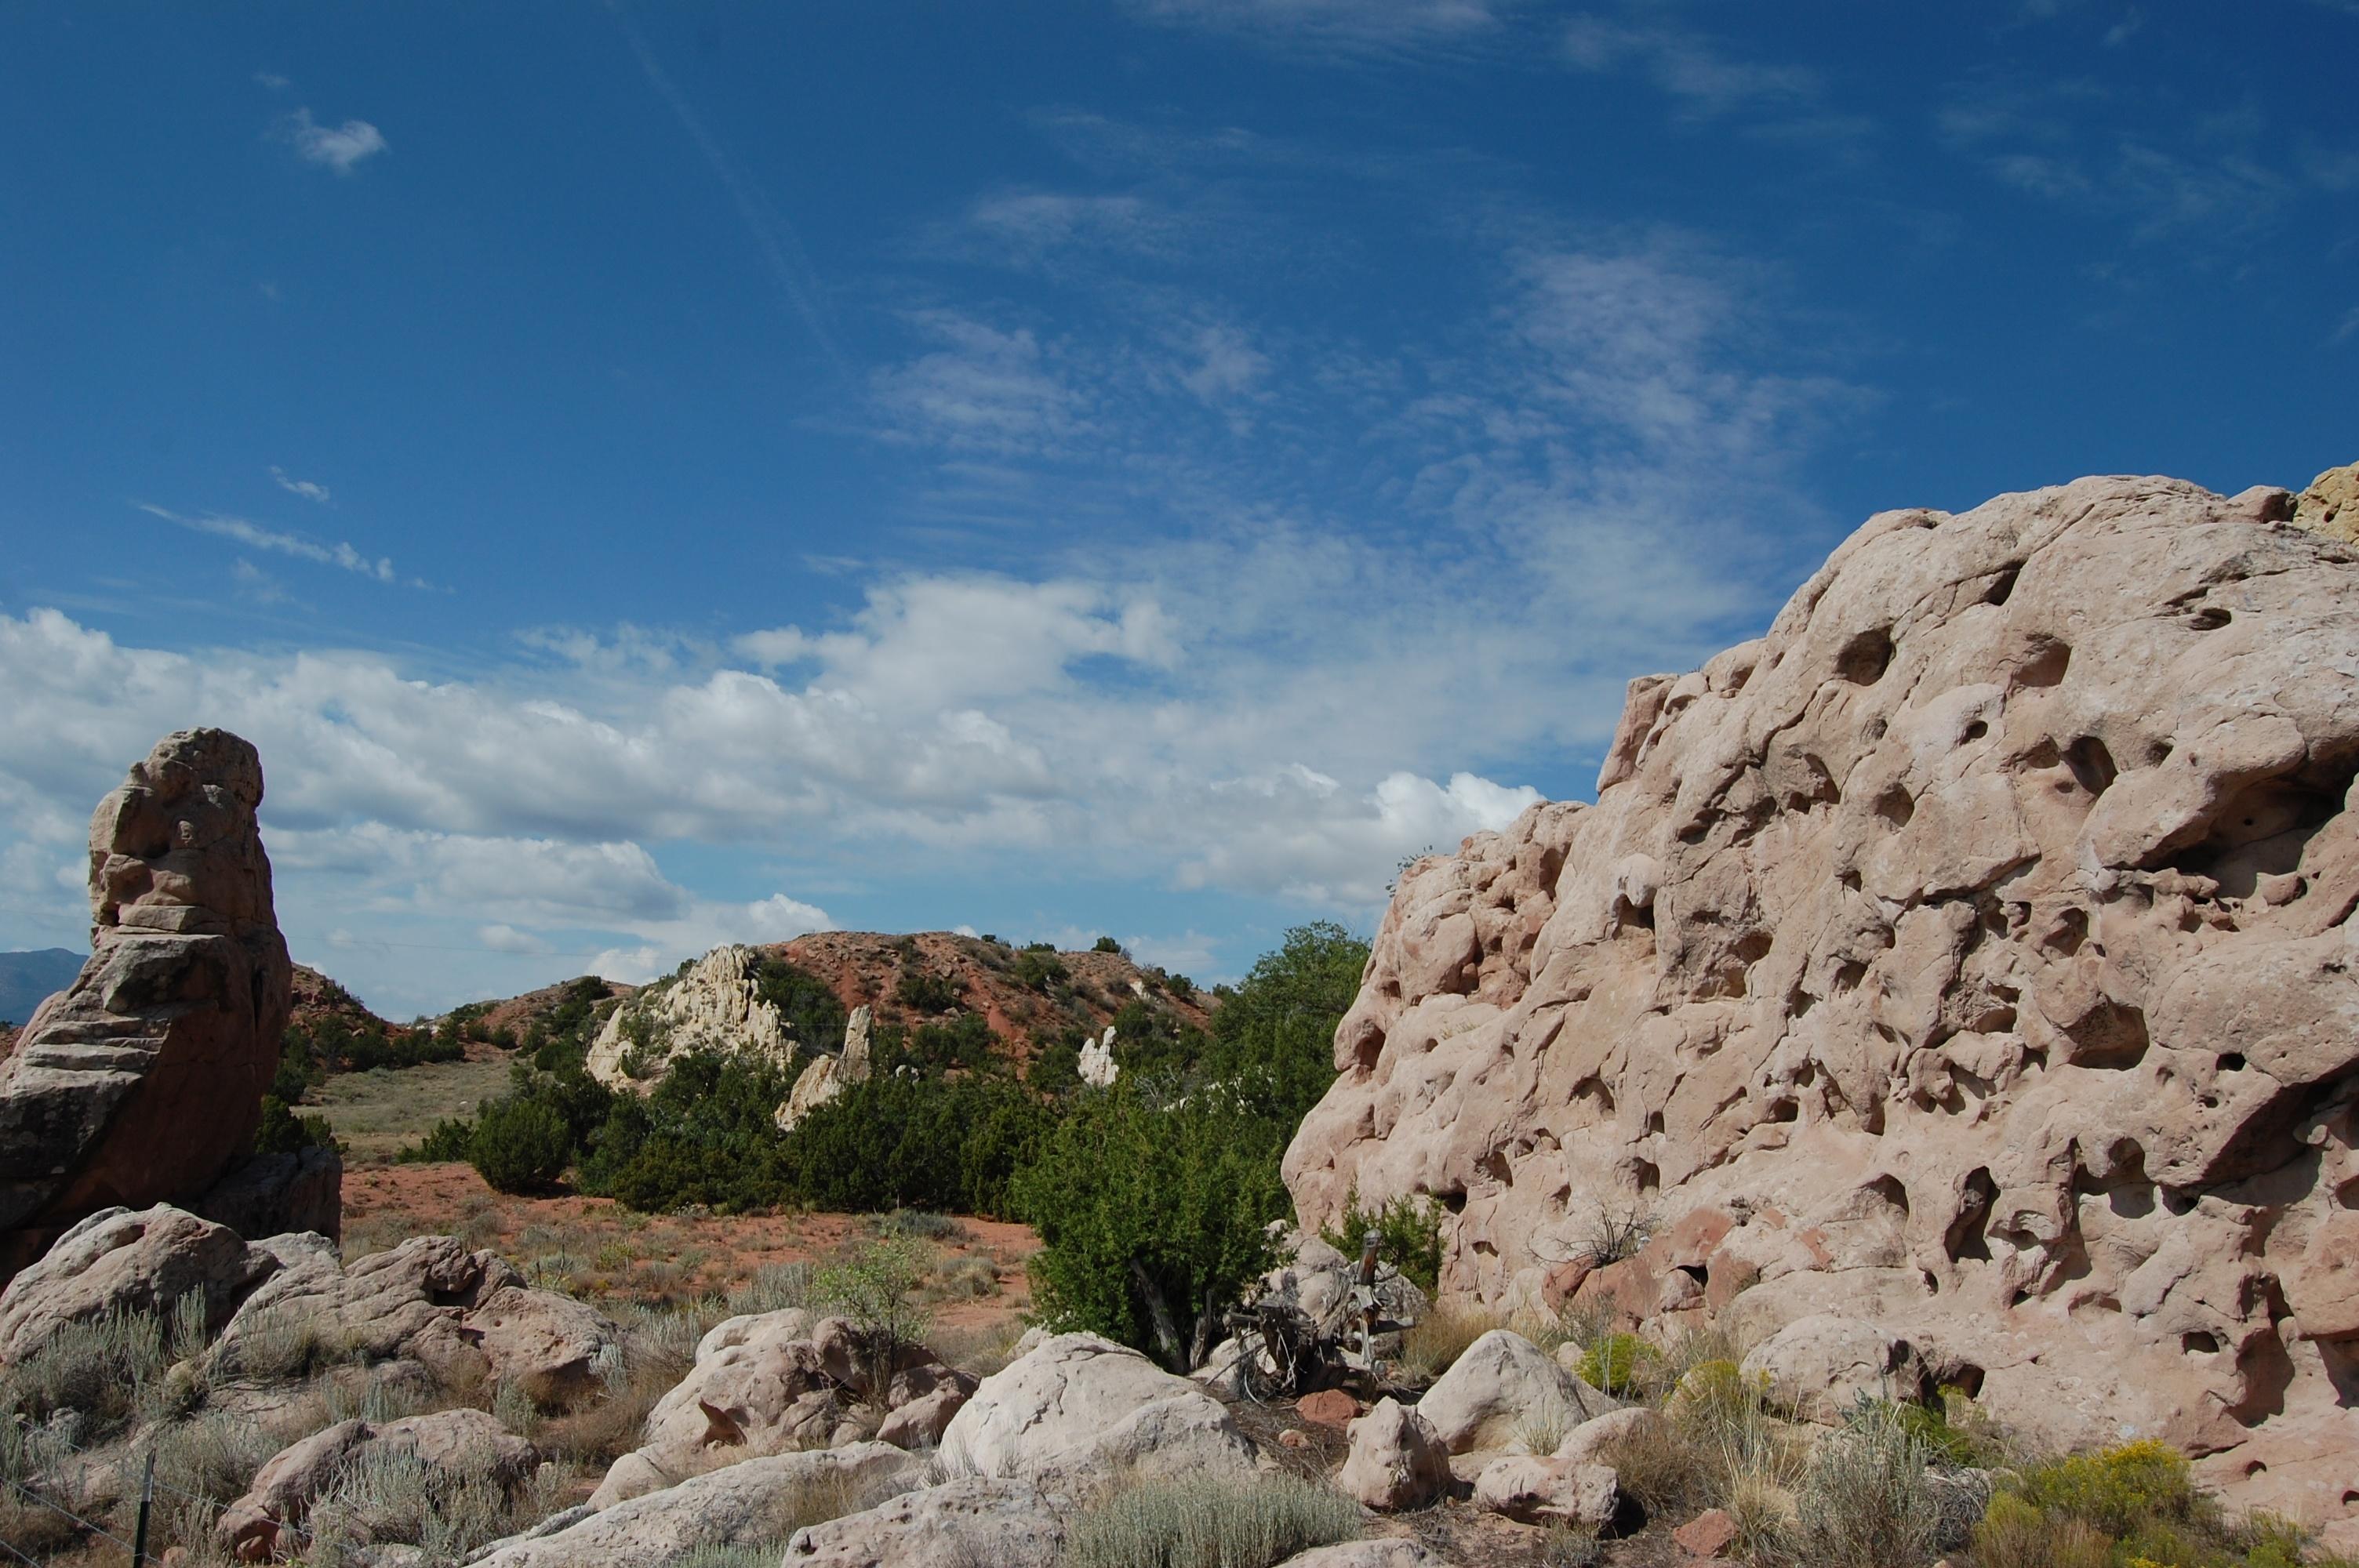 Altitude Of Santa Fe Nm >> Elevation map of Santa Fe County, NM, USA - Topographic ...